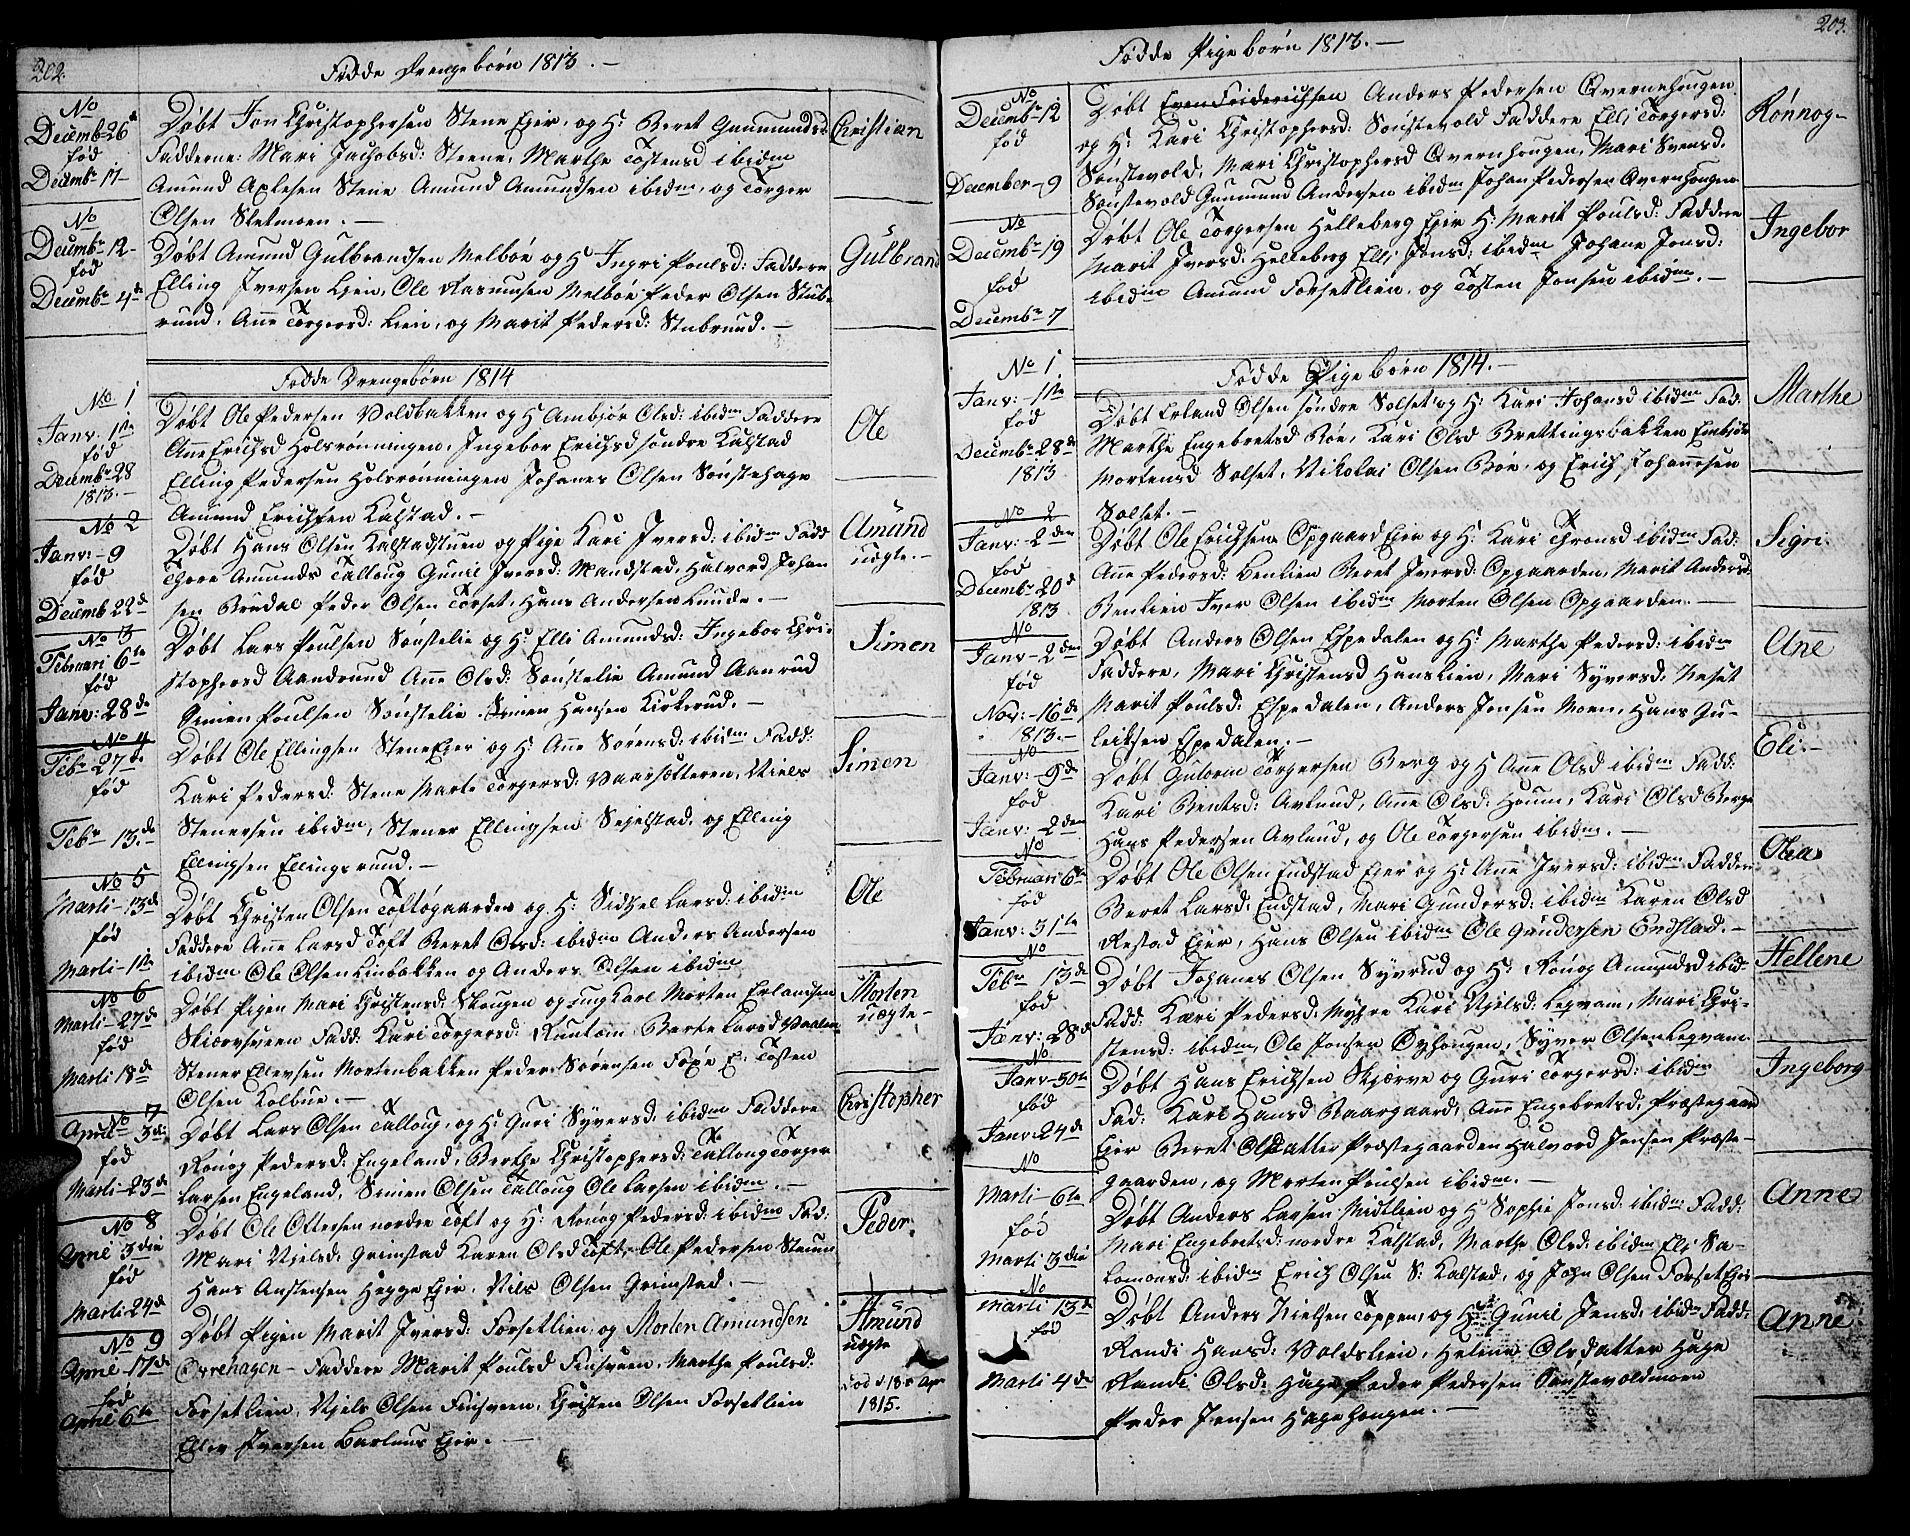 SAH, Gausdal prestekontor, Ministerialbok nr. 4, 1809-1817, s. 202-203